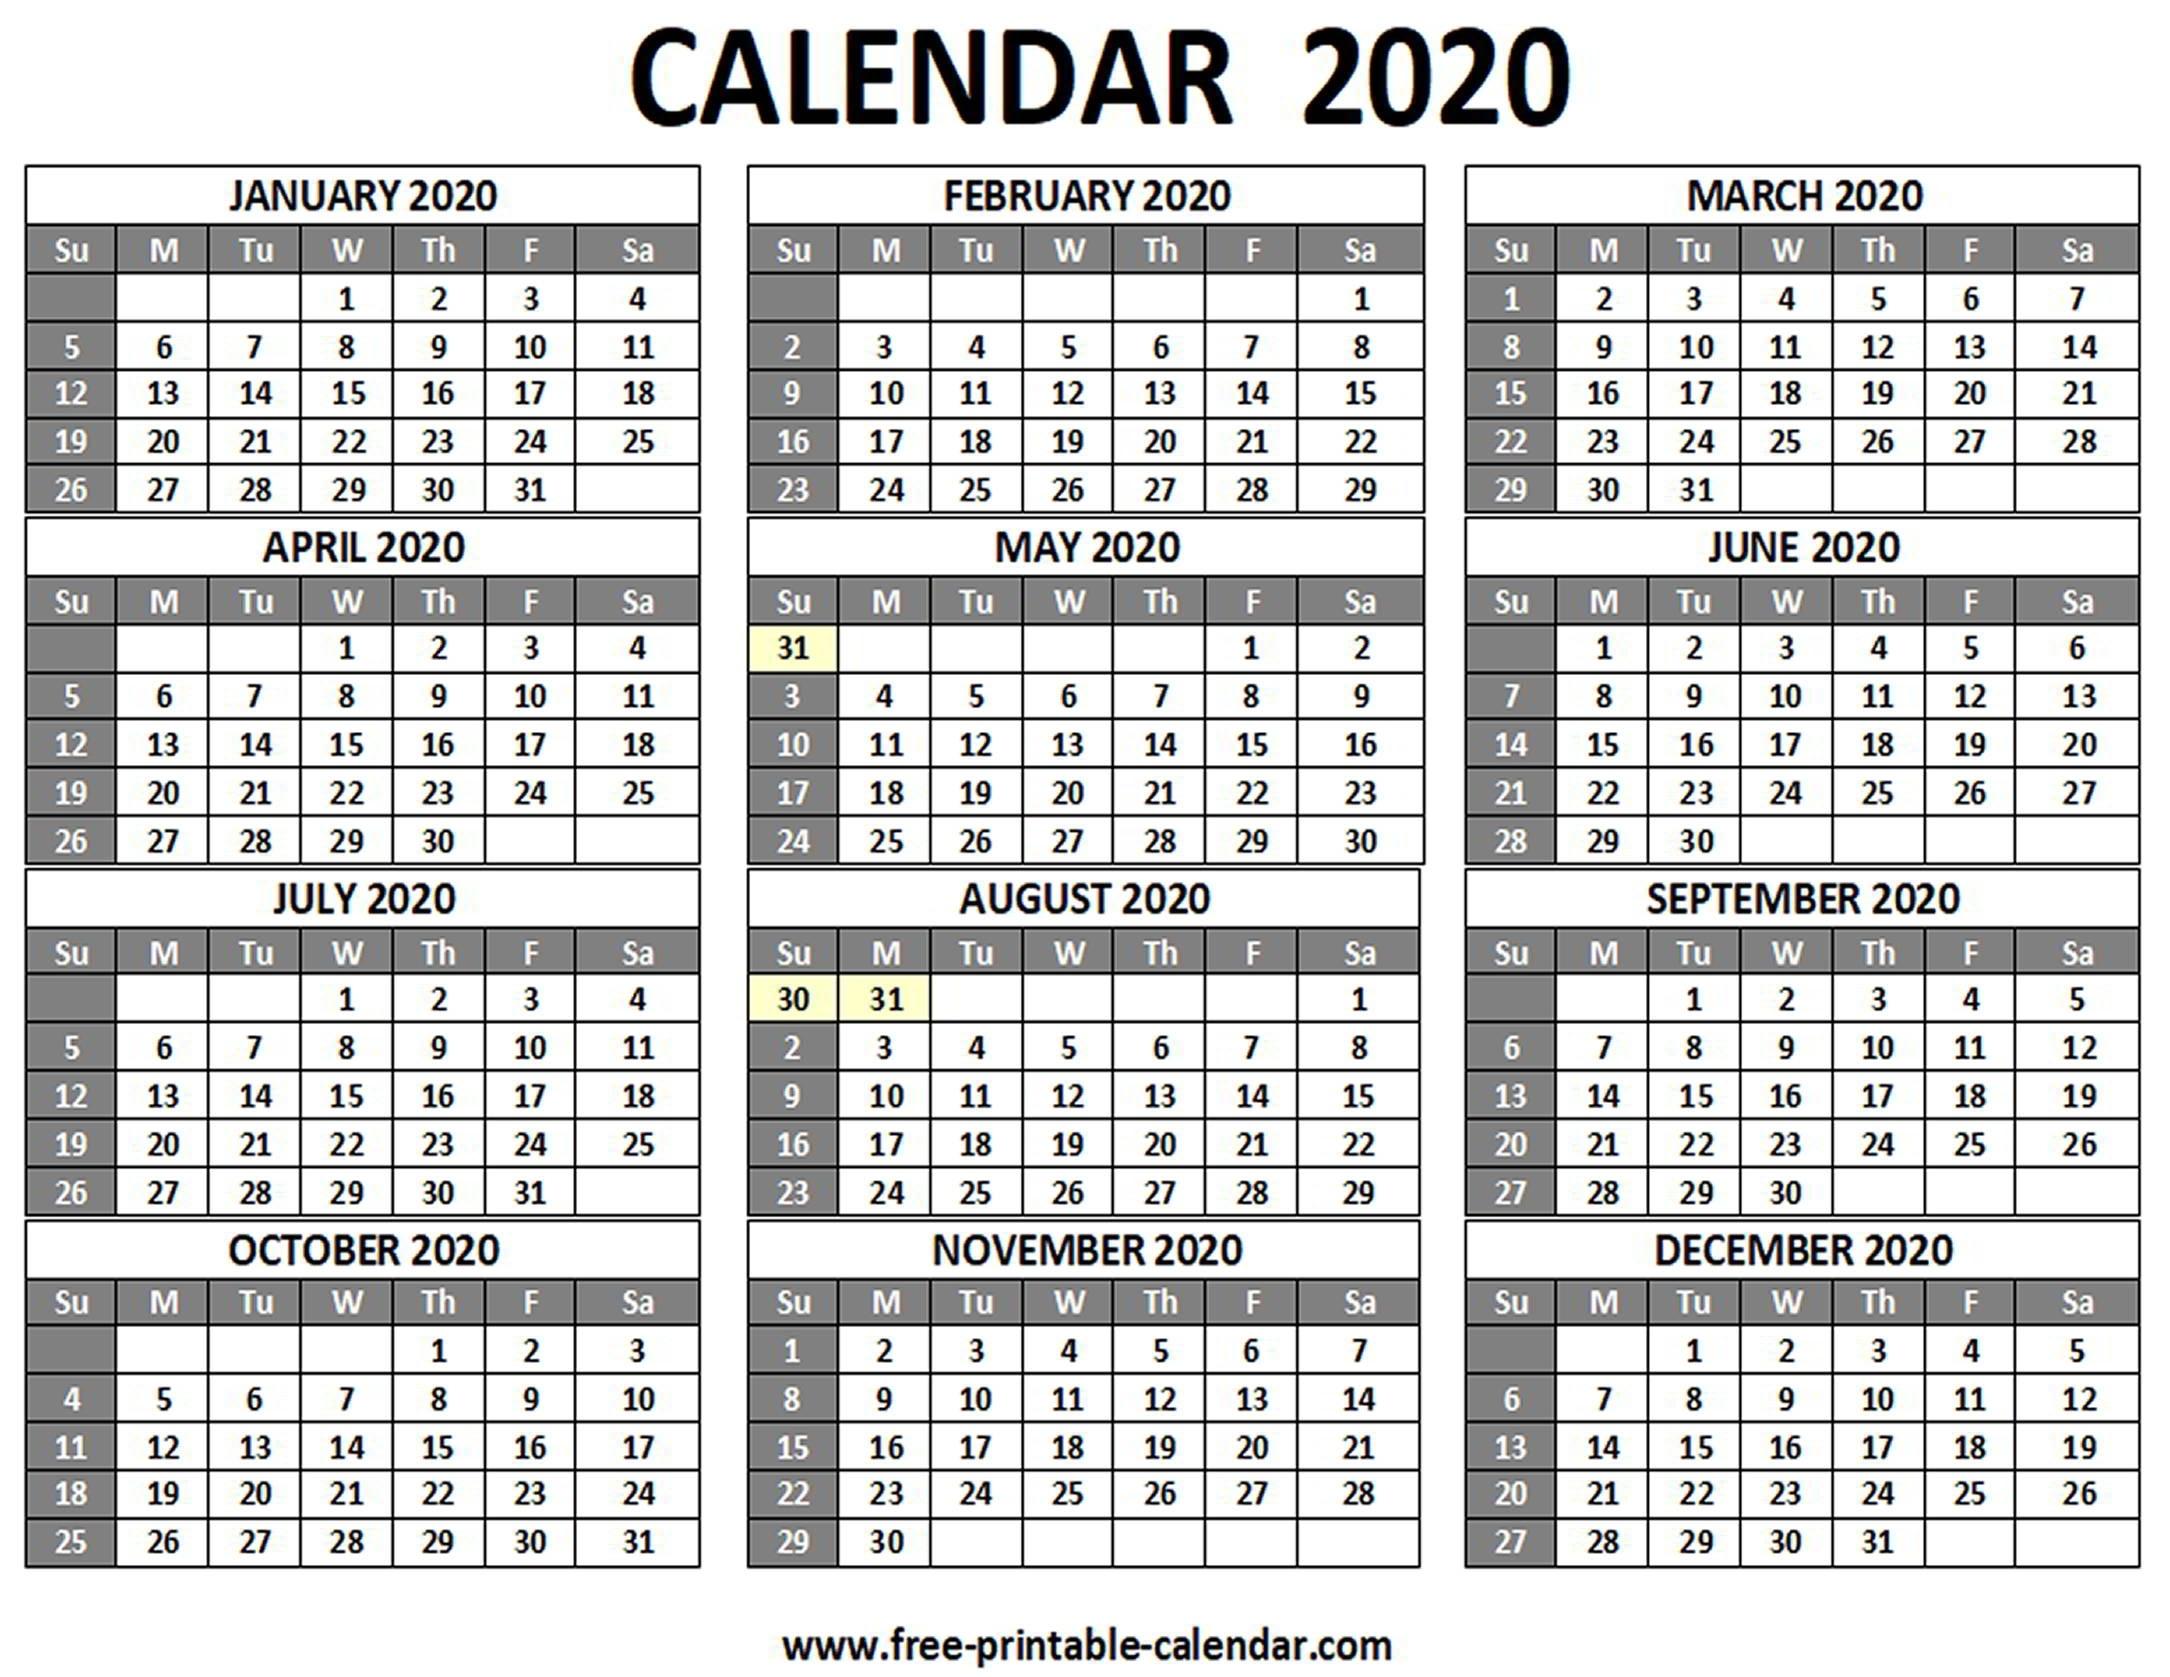 Printable 2020 Calendar - Free-Printable-Calendar Extraordinary Calendar Template 2020 Printable Free Black And White